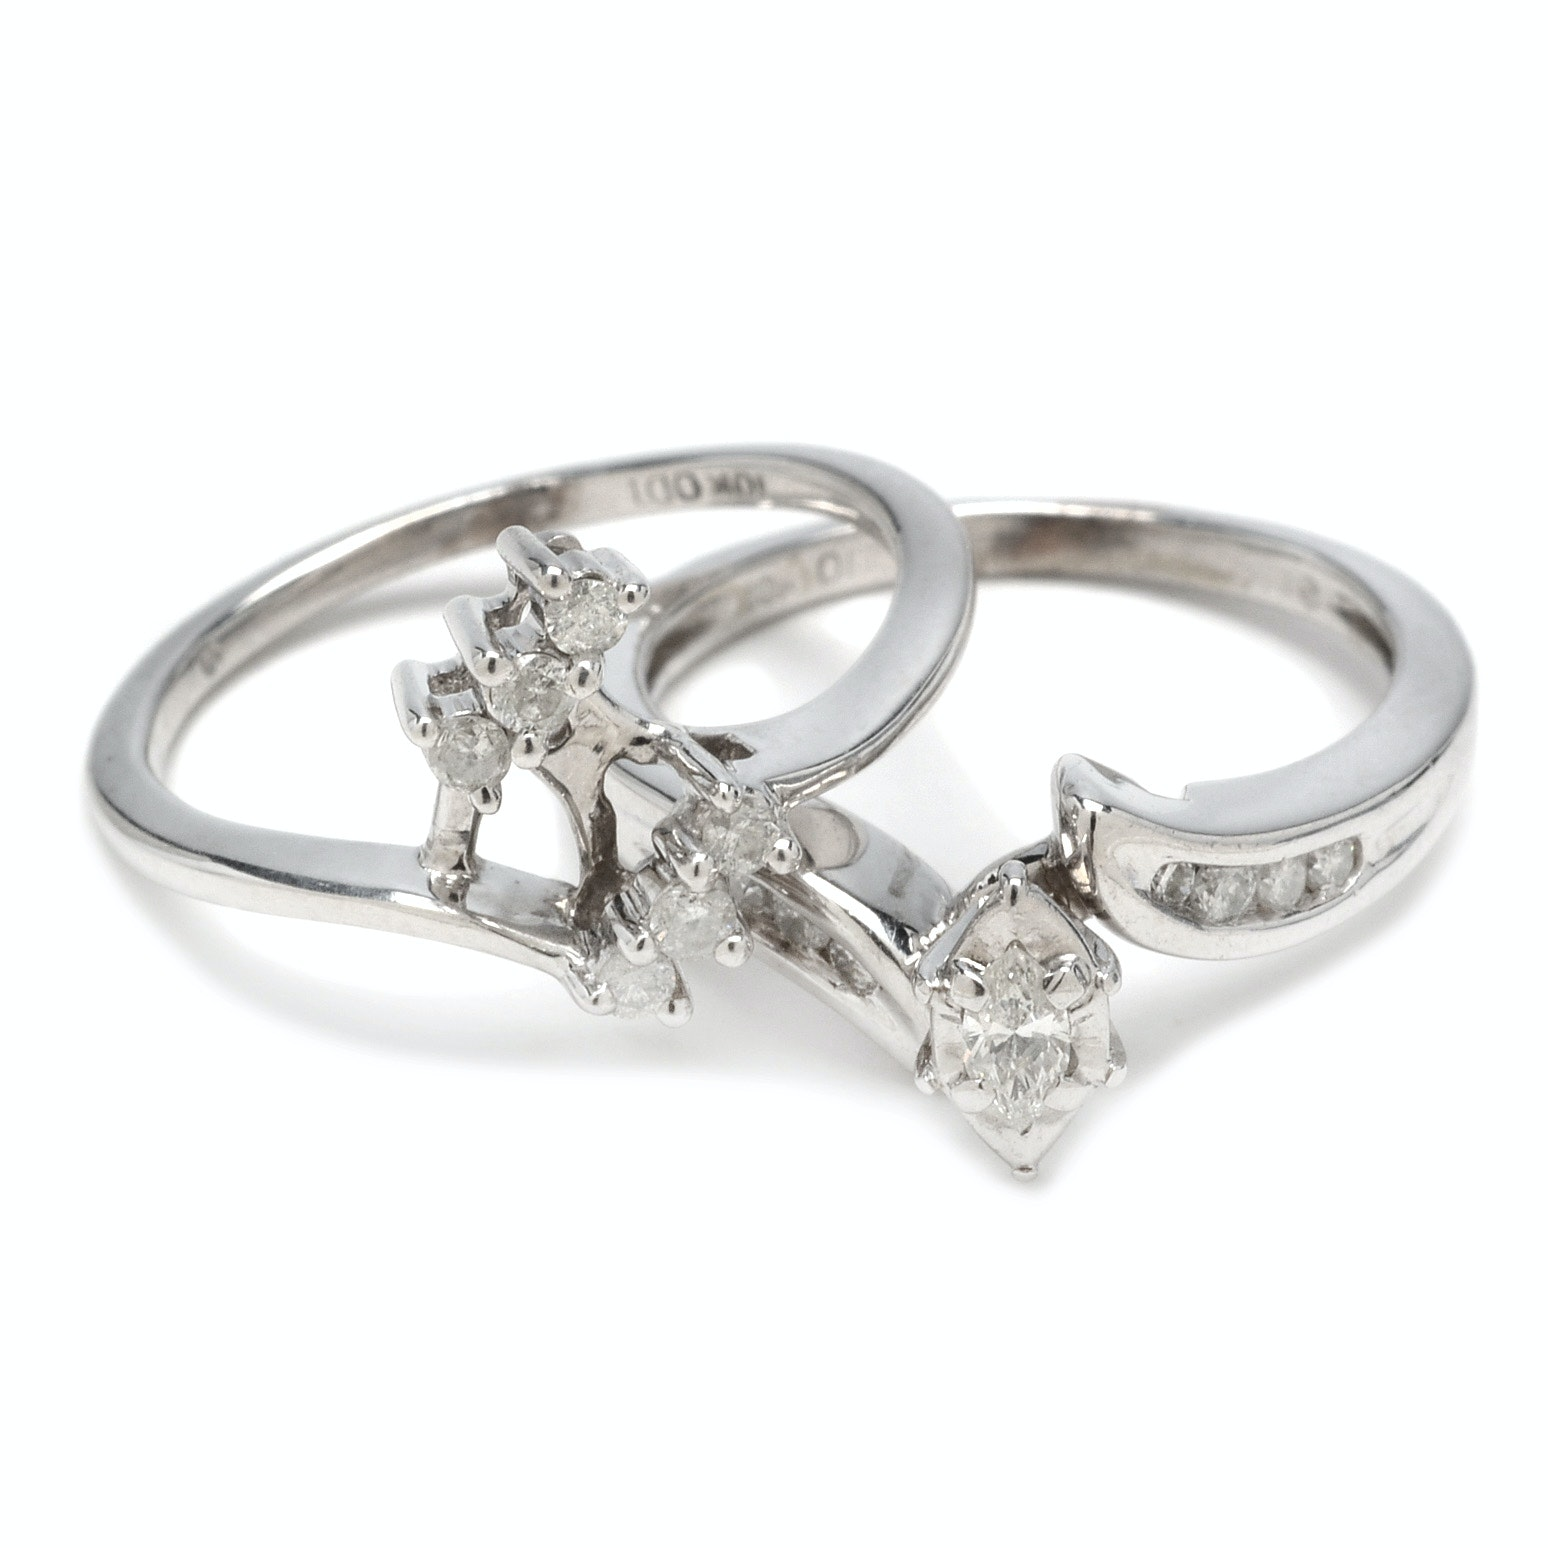 10K White Gold Marquise Diamond Bridal Set